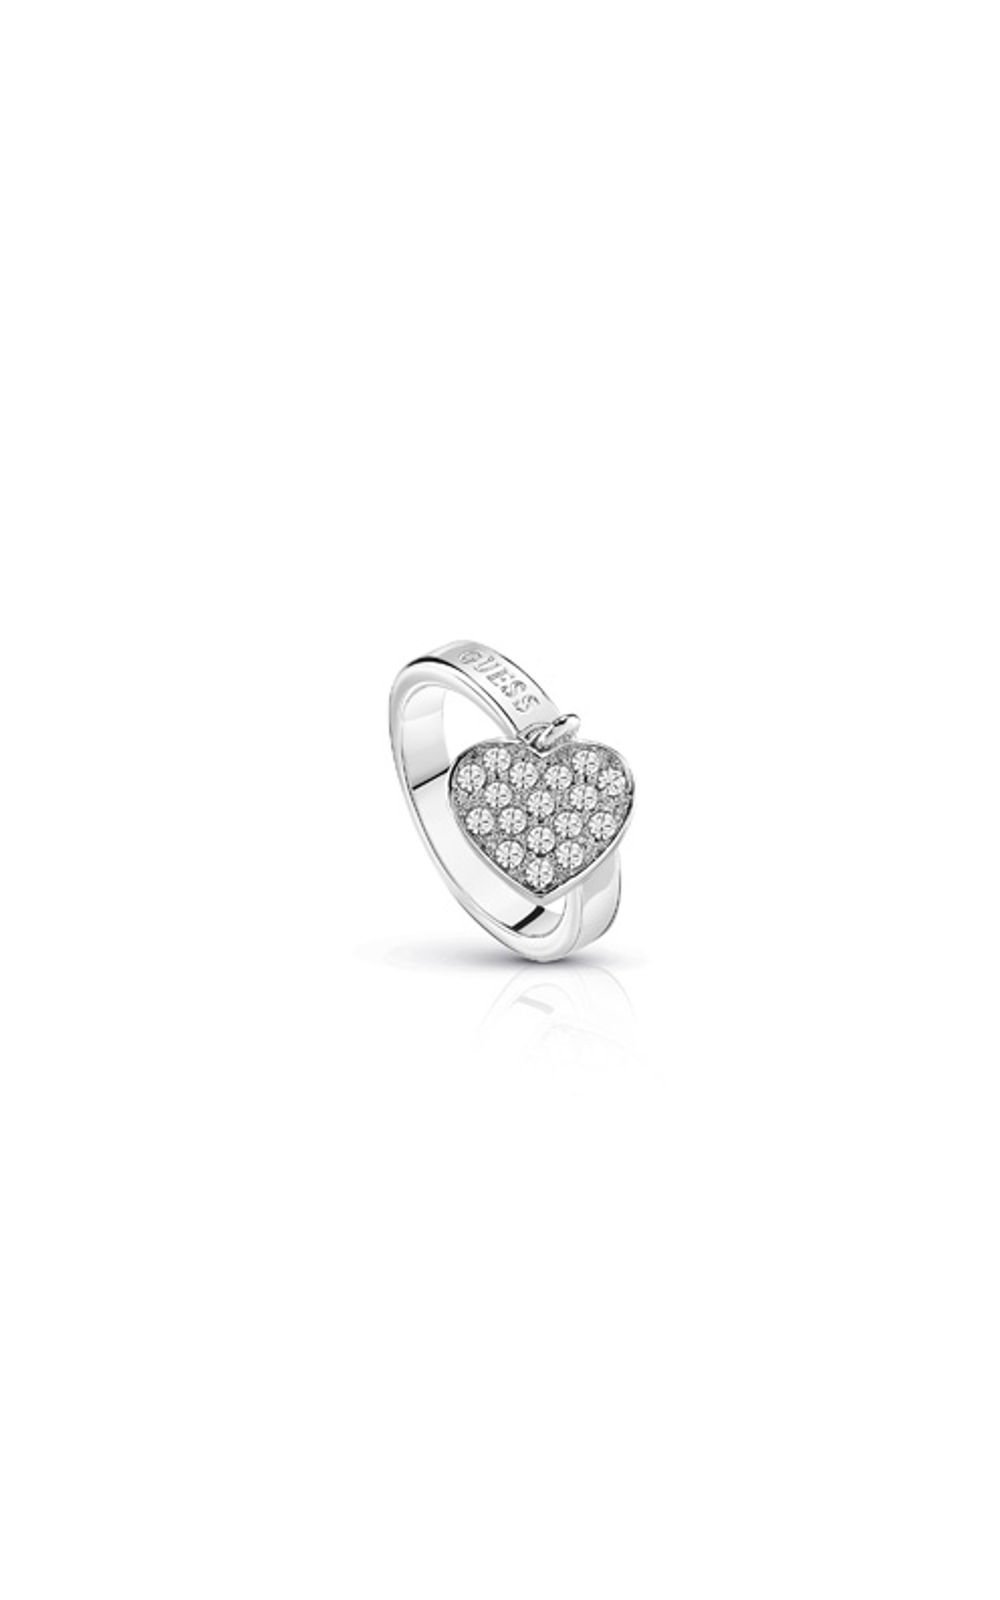 GUESS FAUX UBR84016-54 Ασημένιο Δαχτυλίδι Με Καρδιά